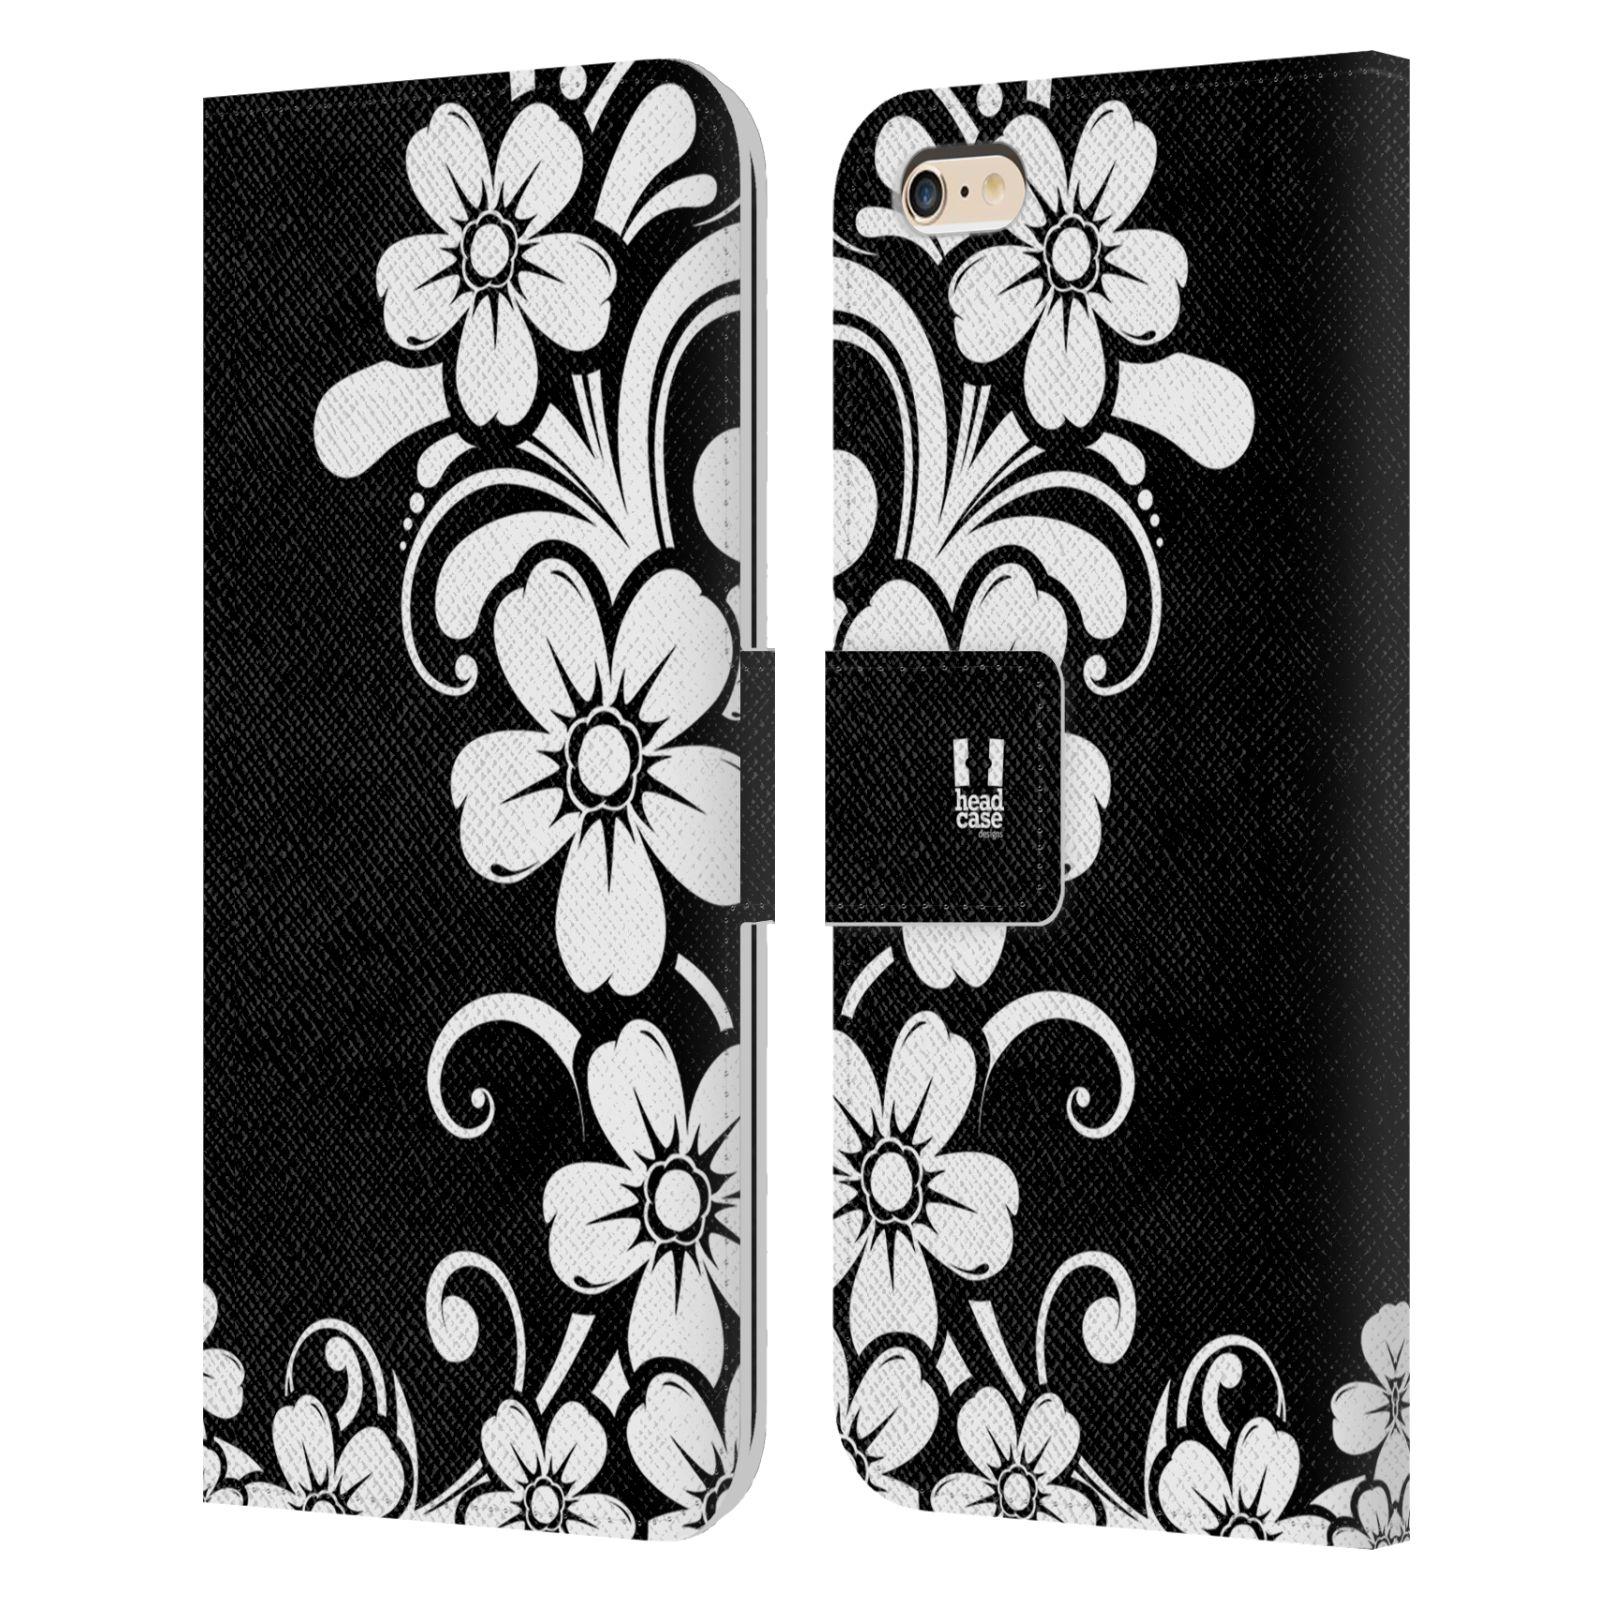 HEAD CASE Flipové pouzdro pro mobil Apple Iphone 6 PLUS / 6S PLUS ČERNOBÍLÁ KVĚTINA květ